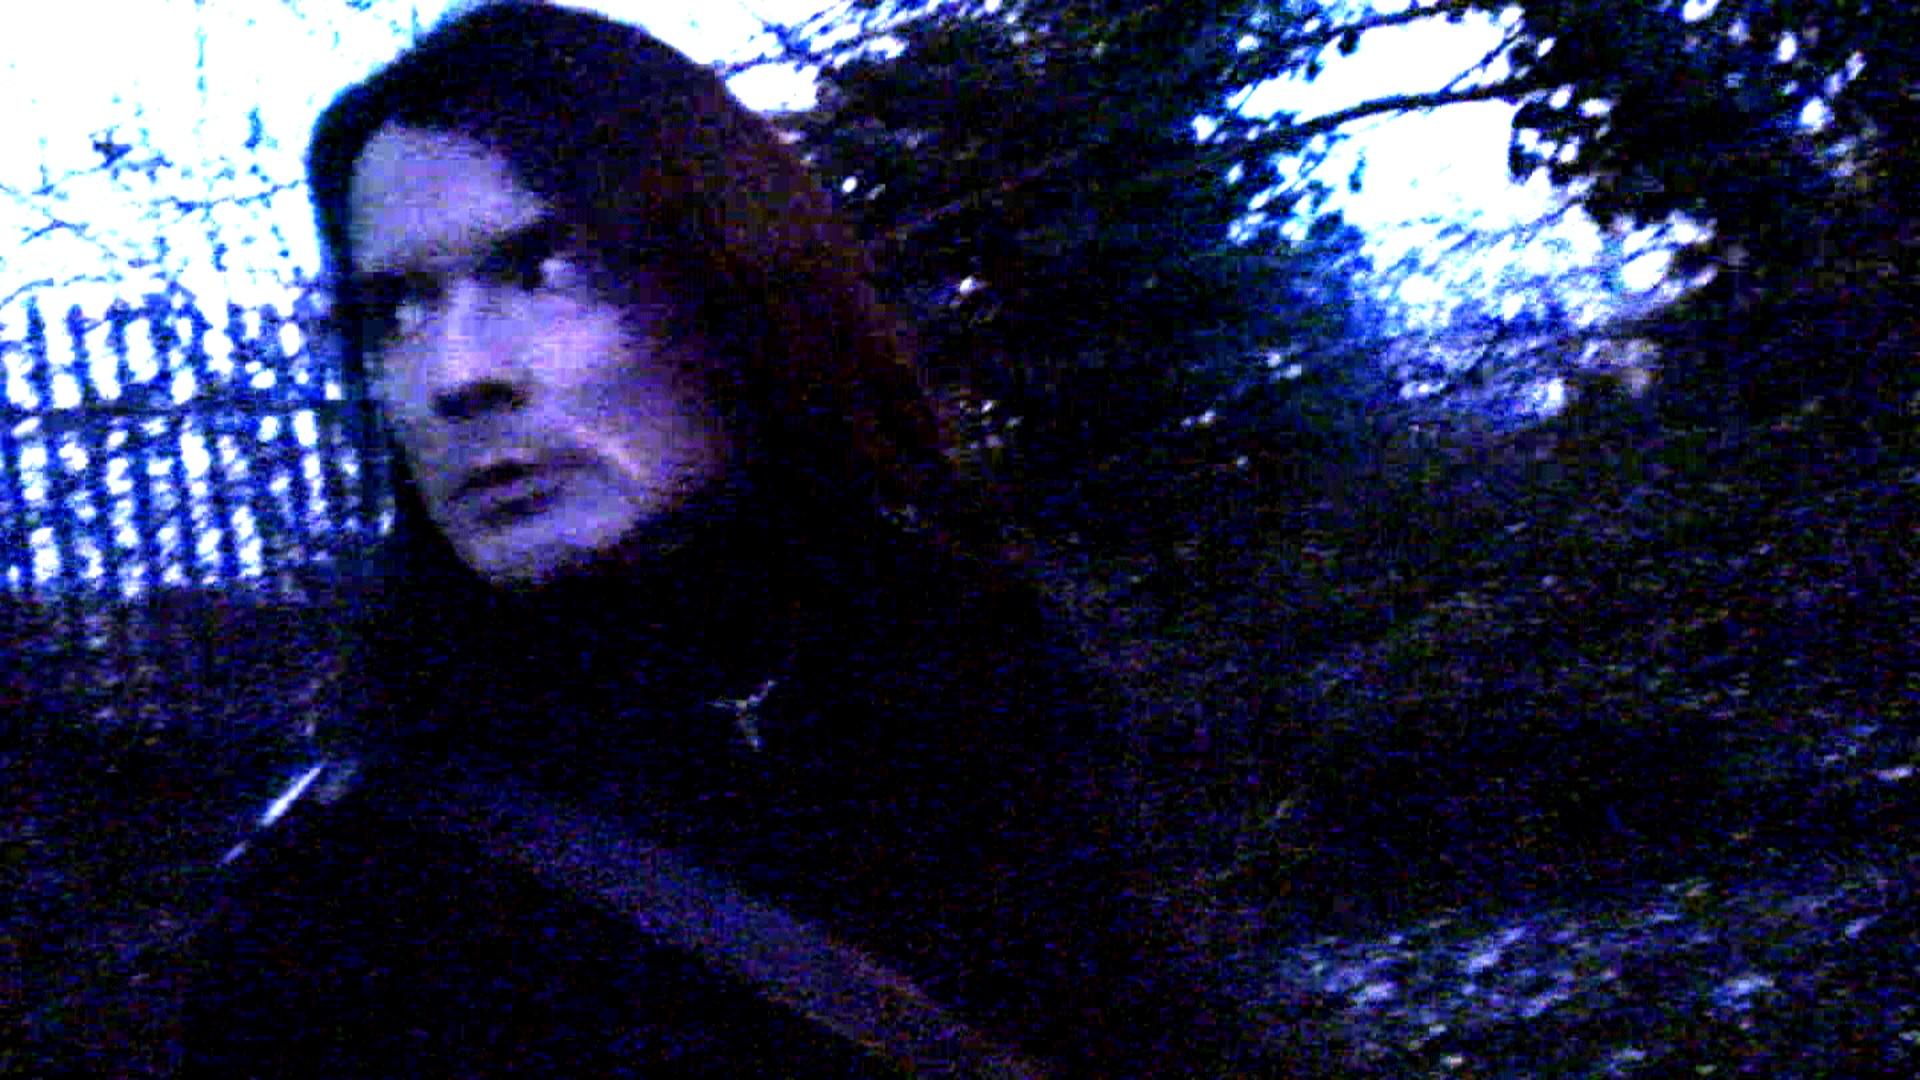 Rohan Quine, 'The Imagination Thief' - film 'MARC 5', still 16